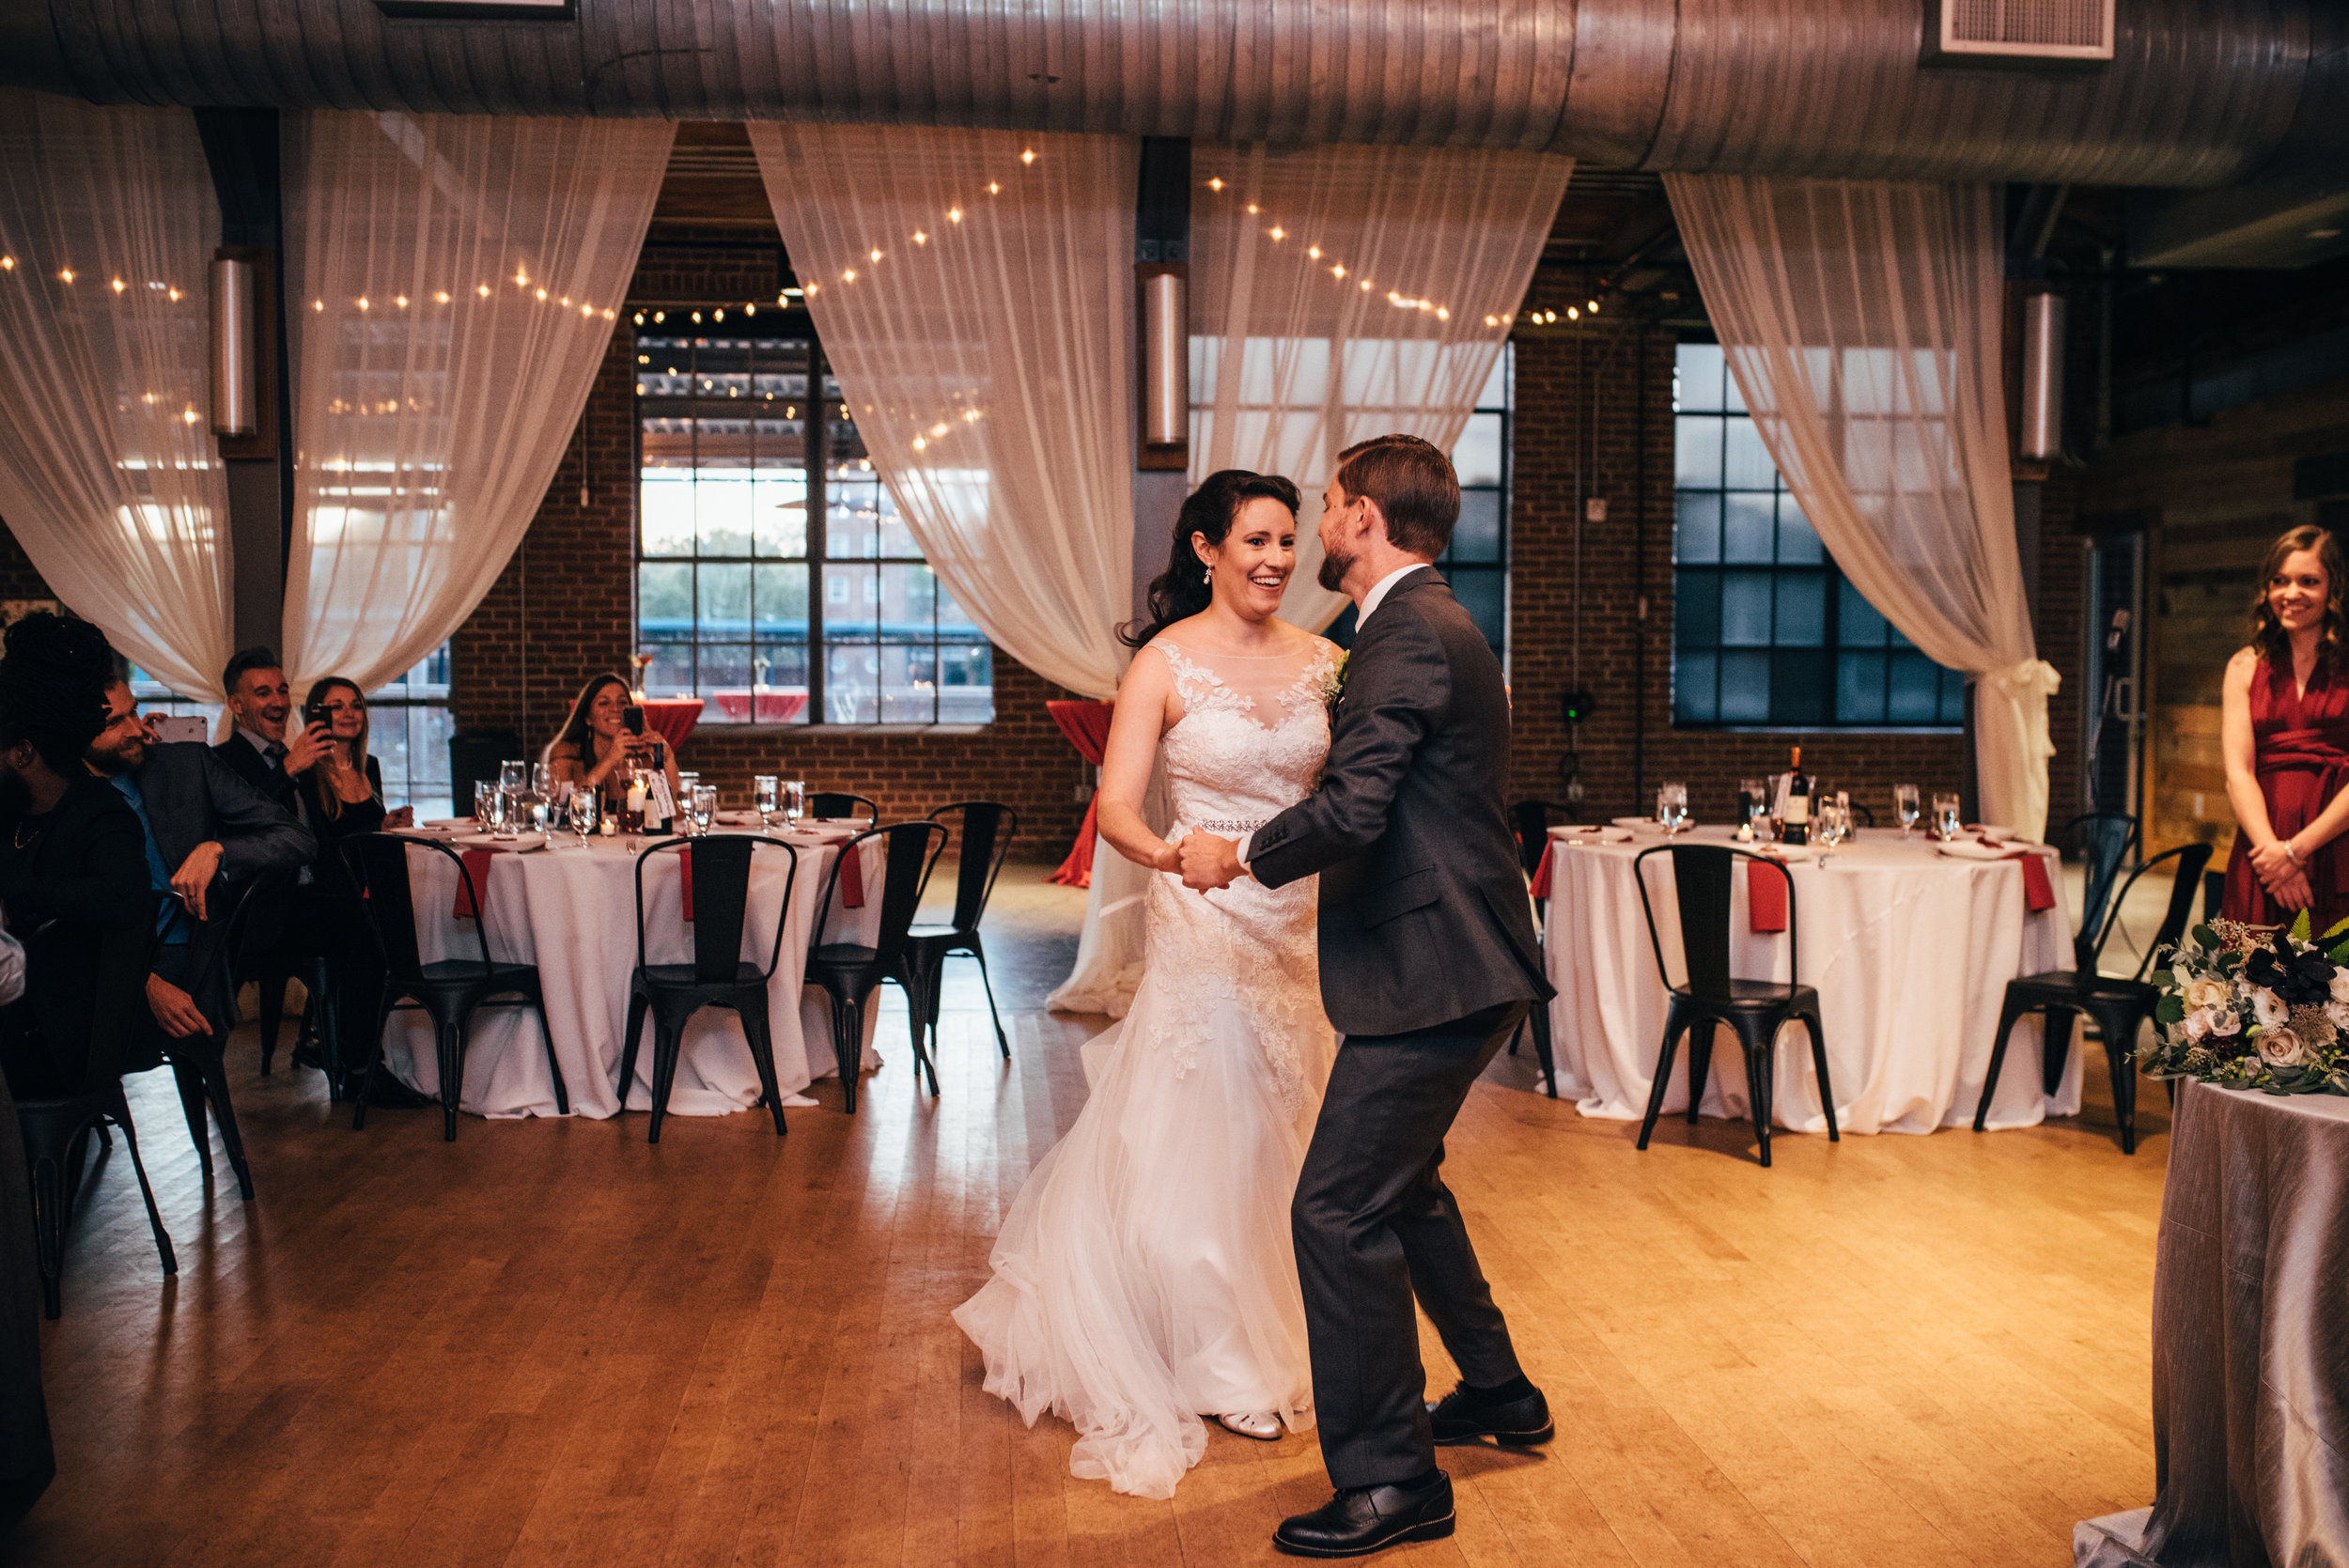 the rickhouse wedding - north carolina wedding photographer - durham wedding photographer